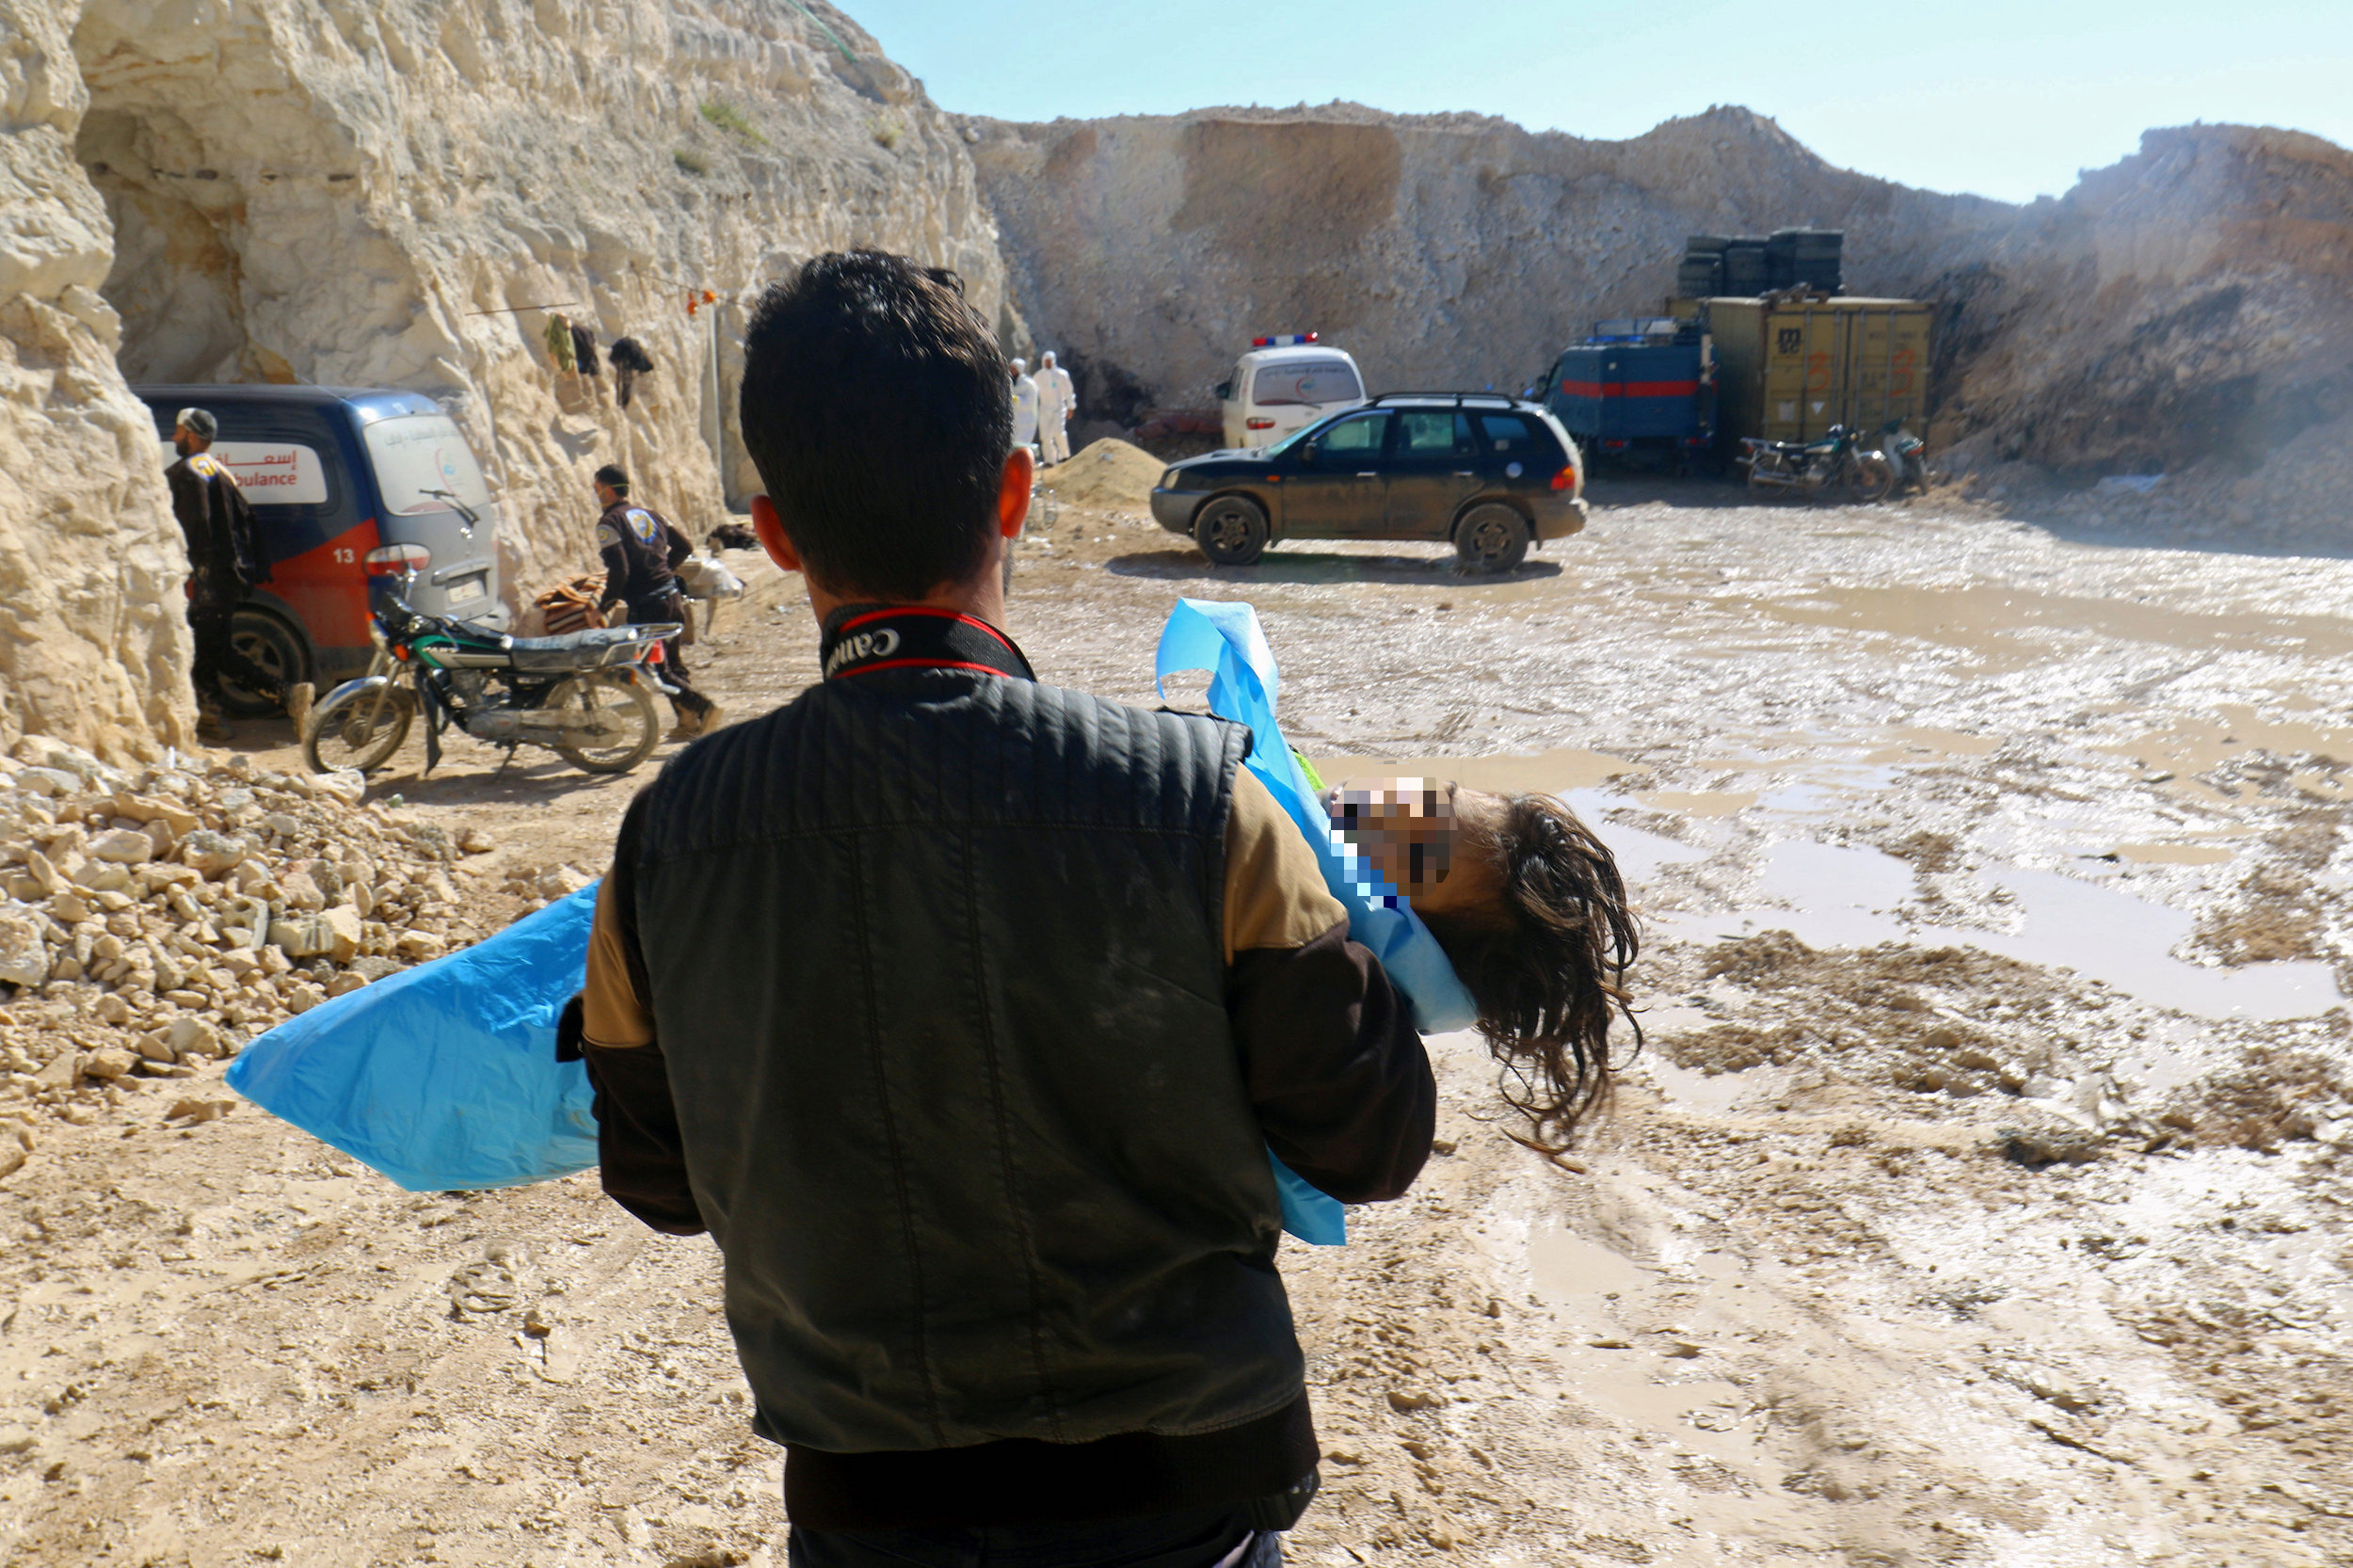 siria ಗೆ ಚಿತ್ರದ ಫಲಿತಾಂಶ